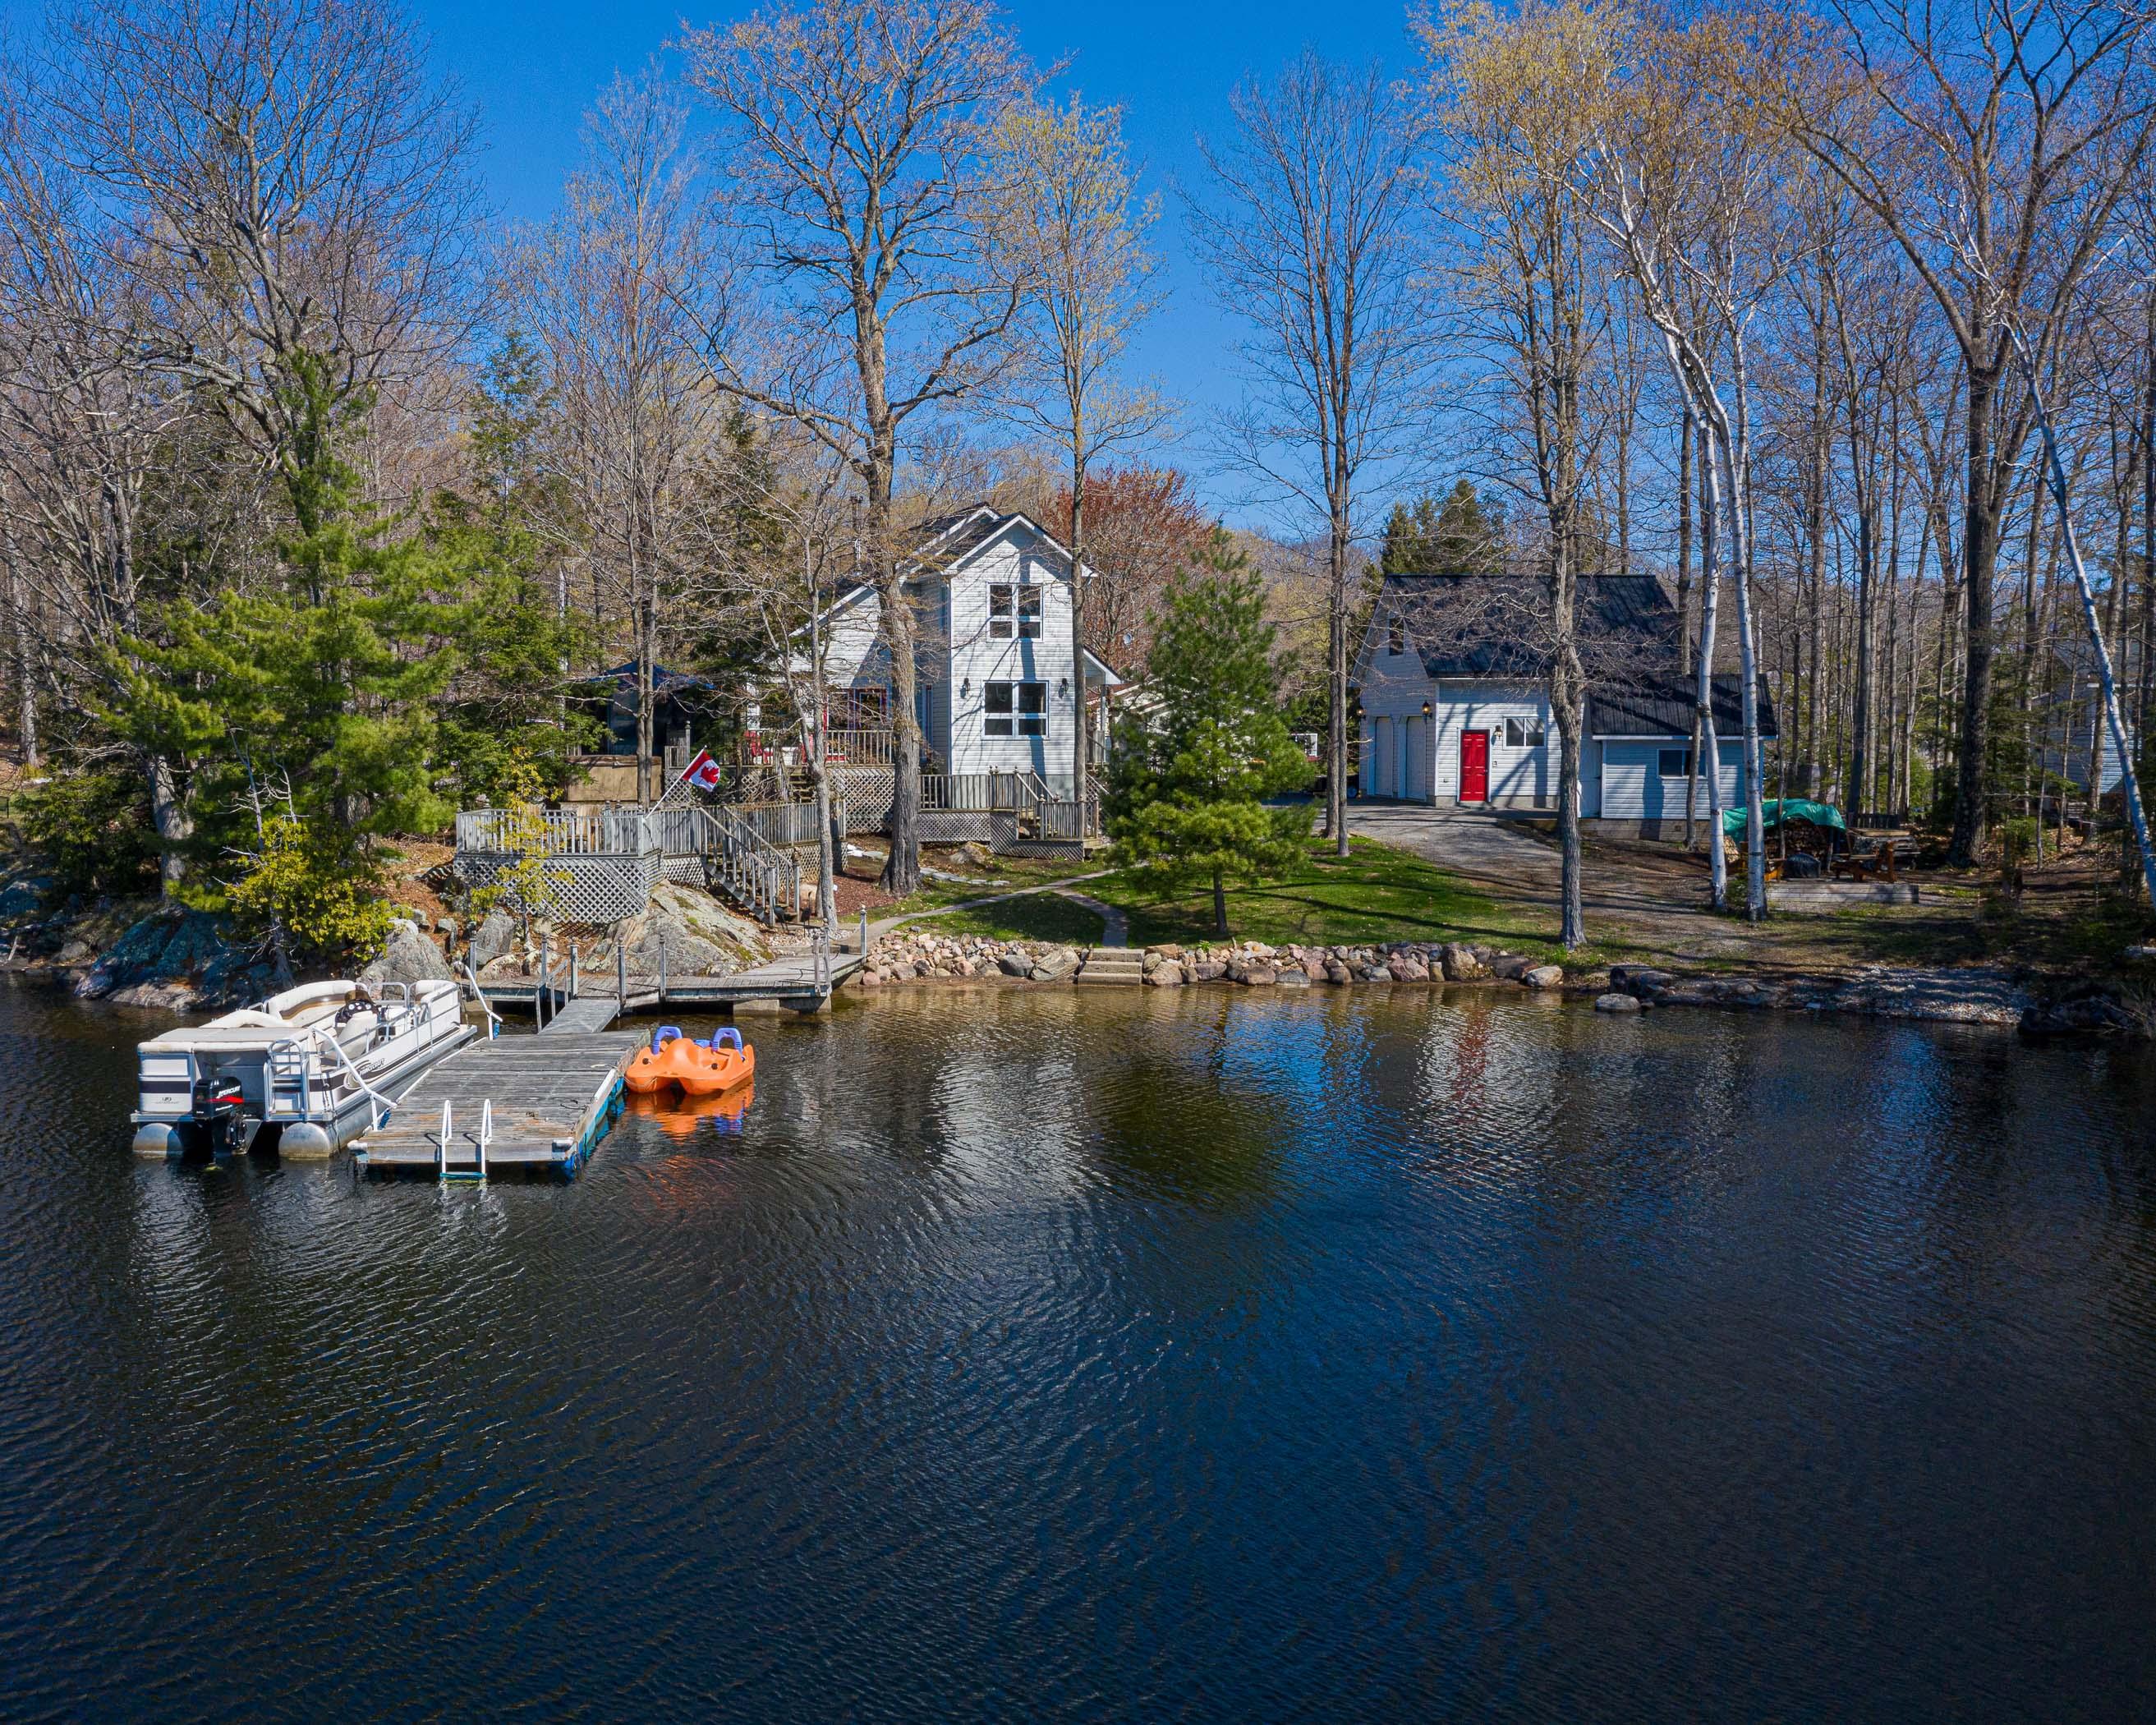 Bob's Lake, $689,000, 340 Pineshores Lane, Tichborne, Ontario